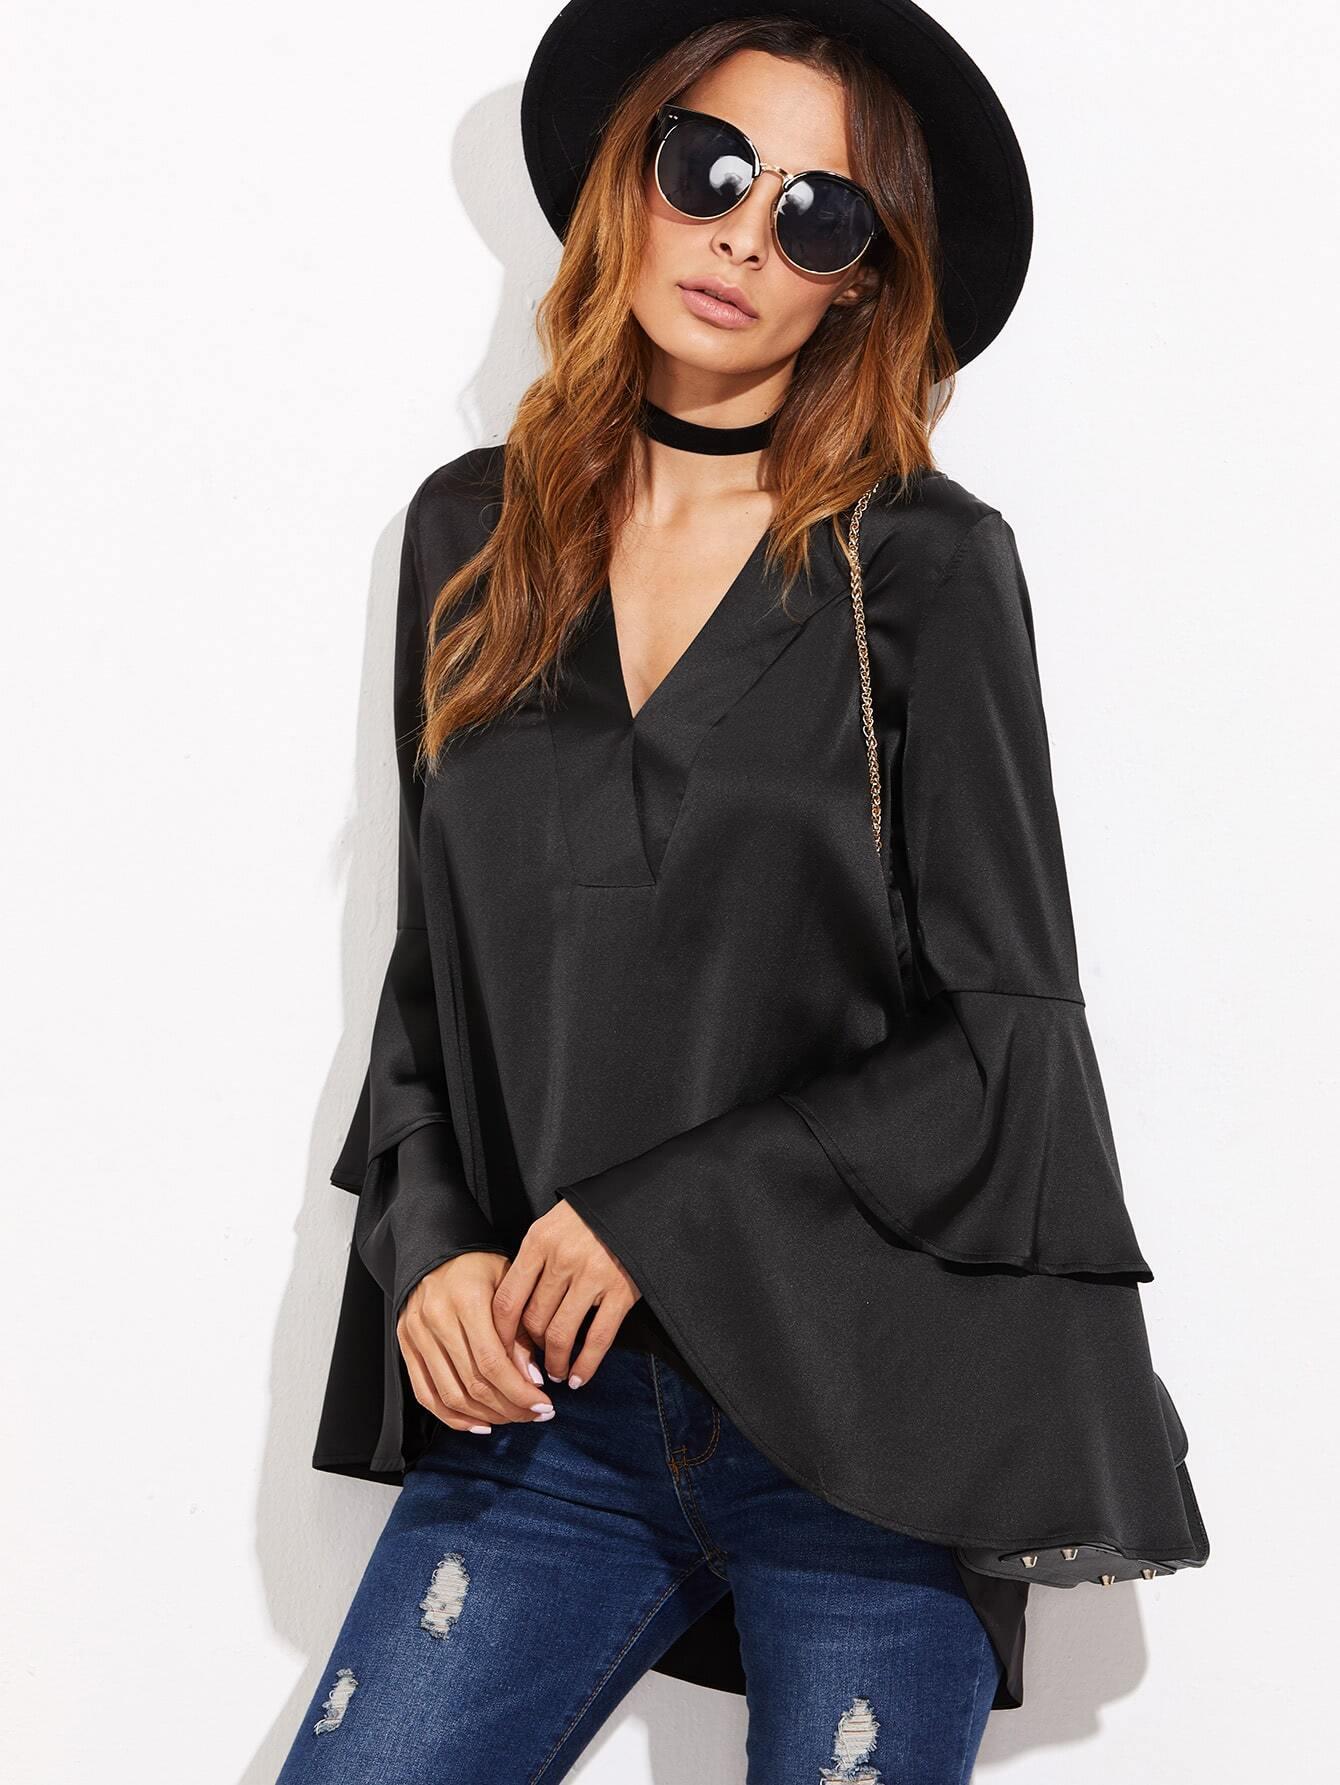 blouse161024704_1 - 副本